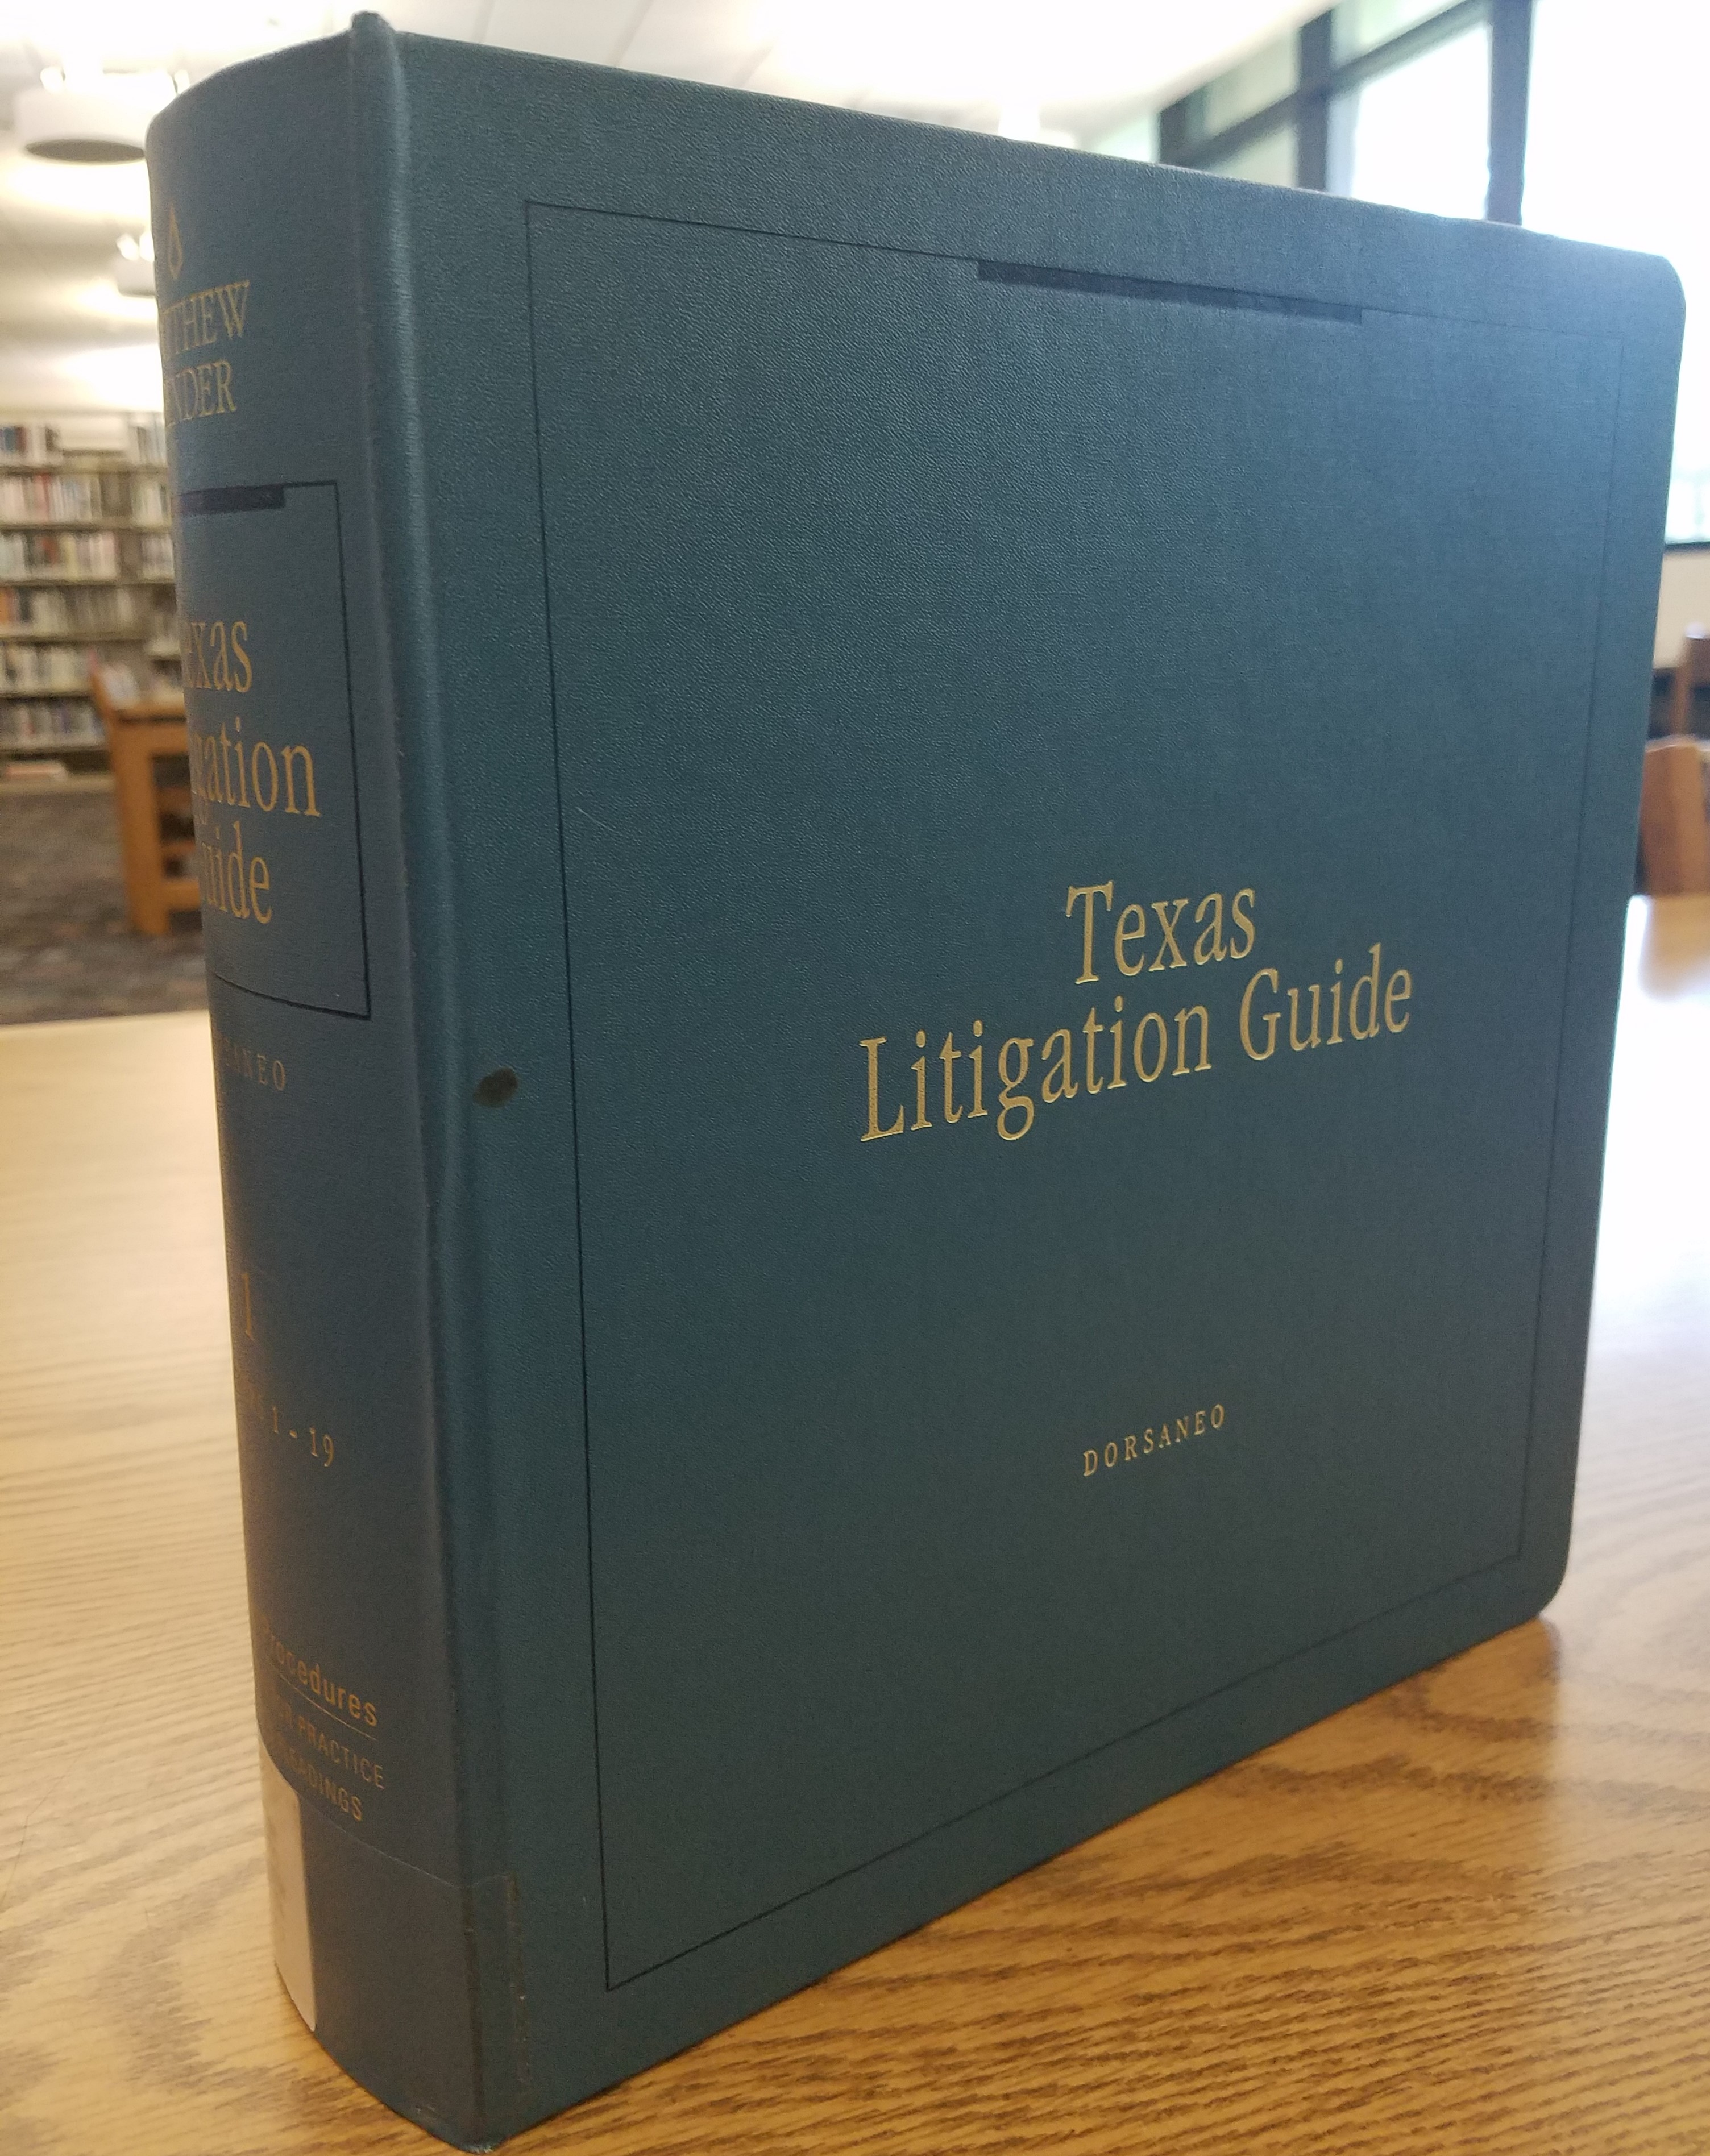 Texas Litigation Guide